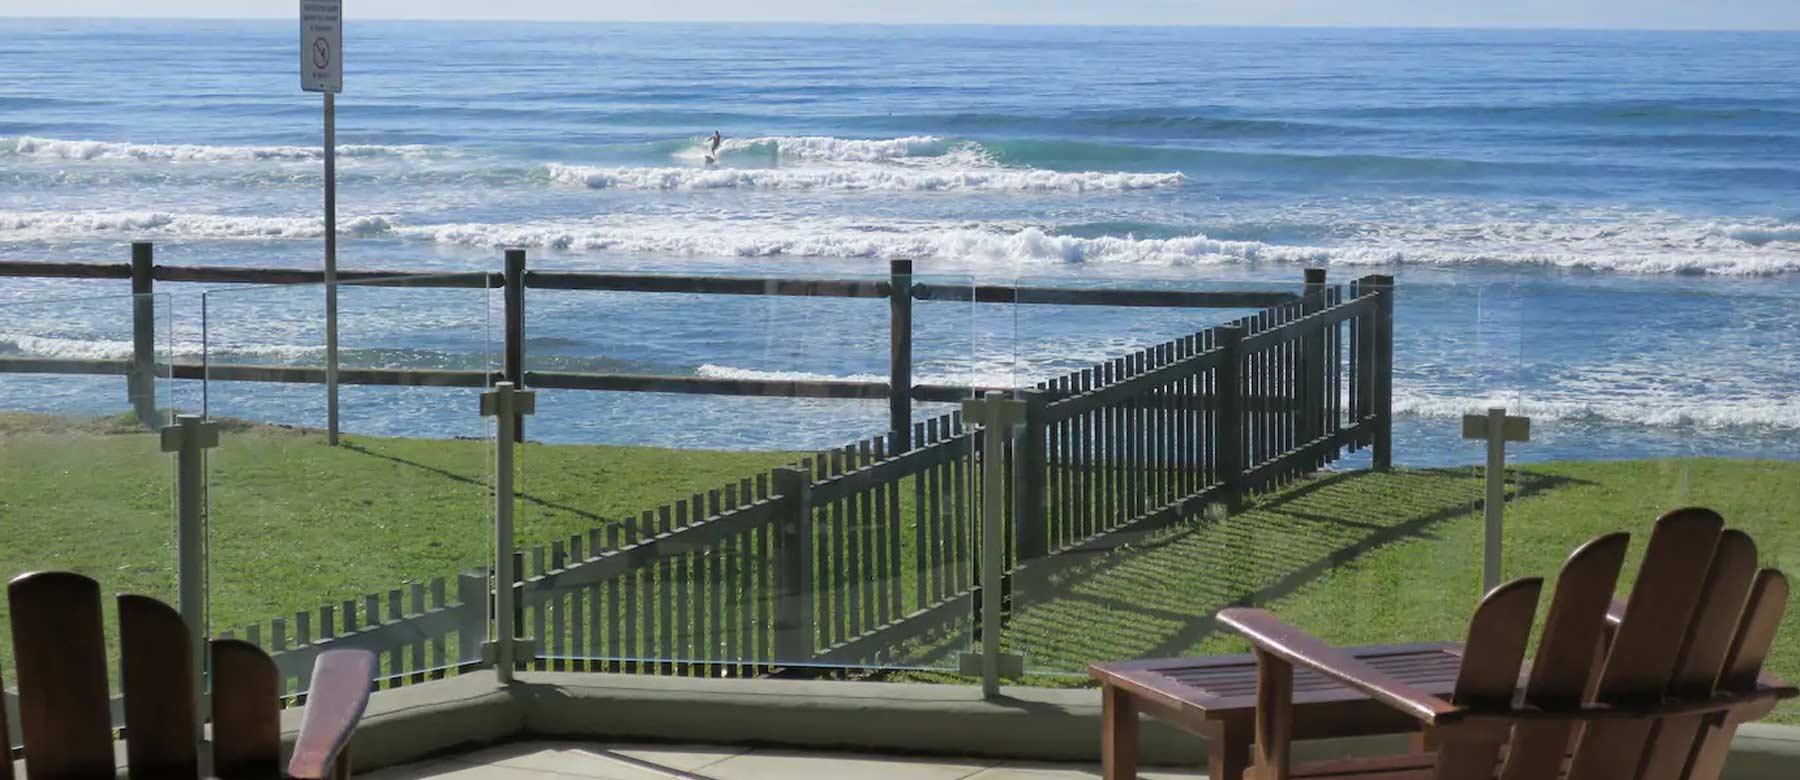 LennoxHead-surfing